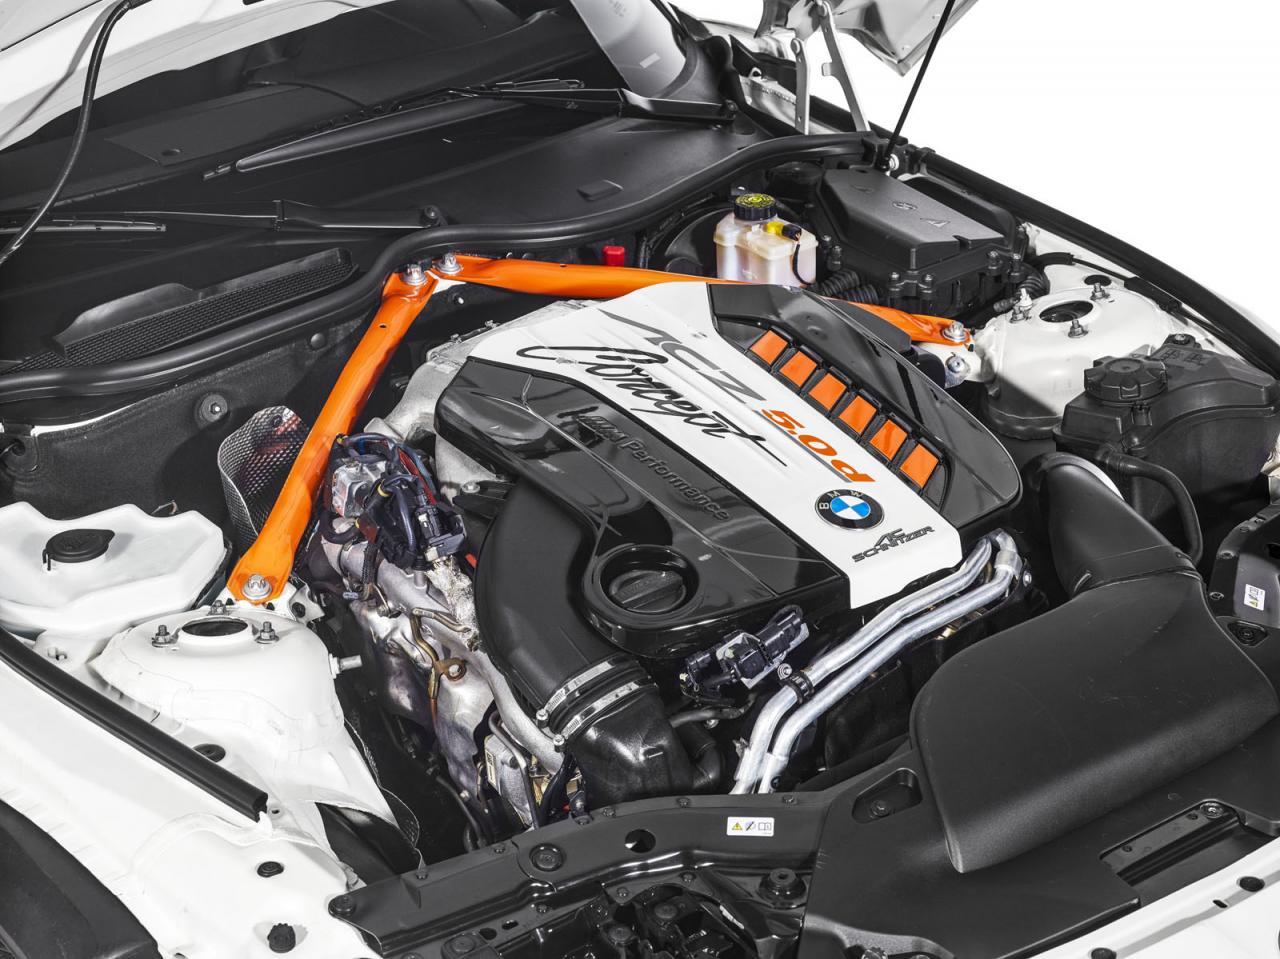 Ac Schnitzer Bmw Z4 5 0d Has 3 0l Tri Turbo Diesel